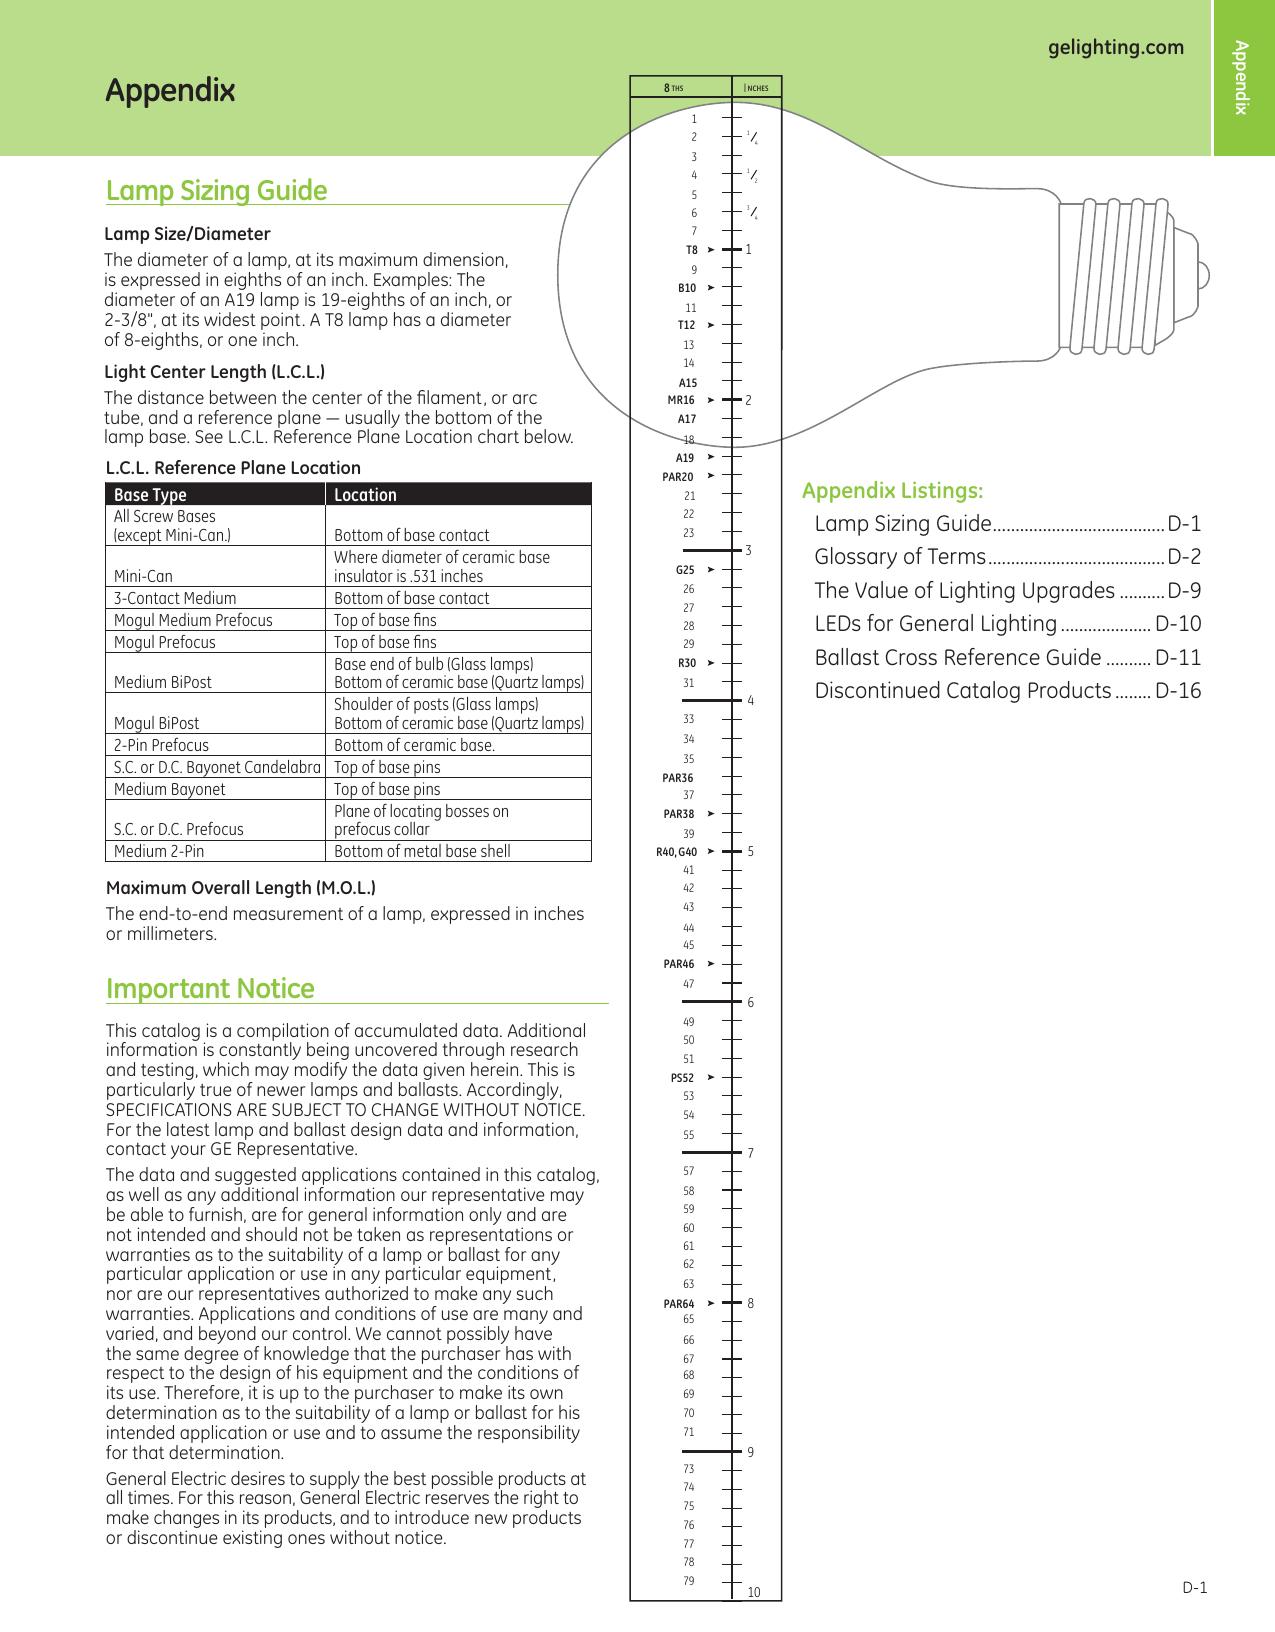 ge lamp \u0026 ballast products catalog \u2014 section d brochure6eu F Ge Ballast Wiring Diagram Universal Ballast Wiring Diagrams #7